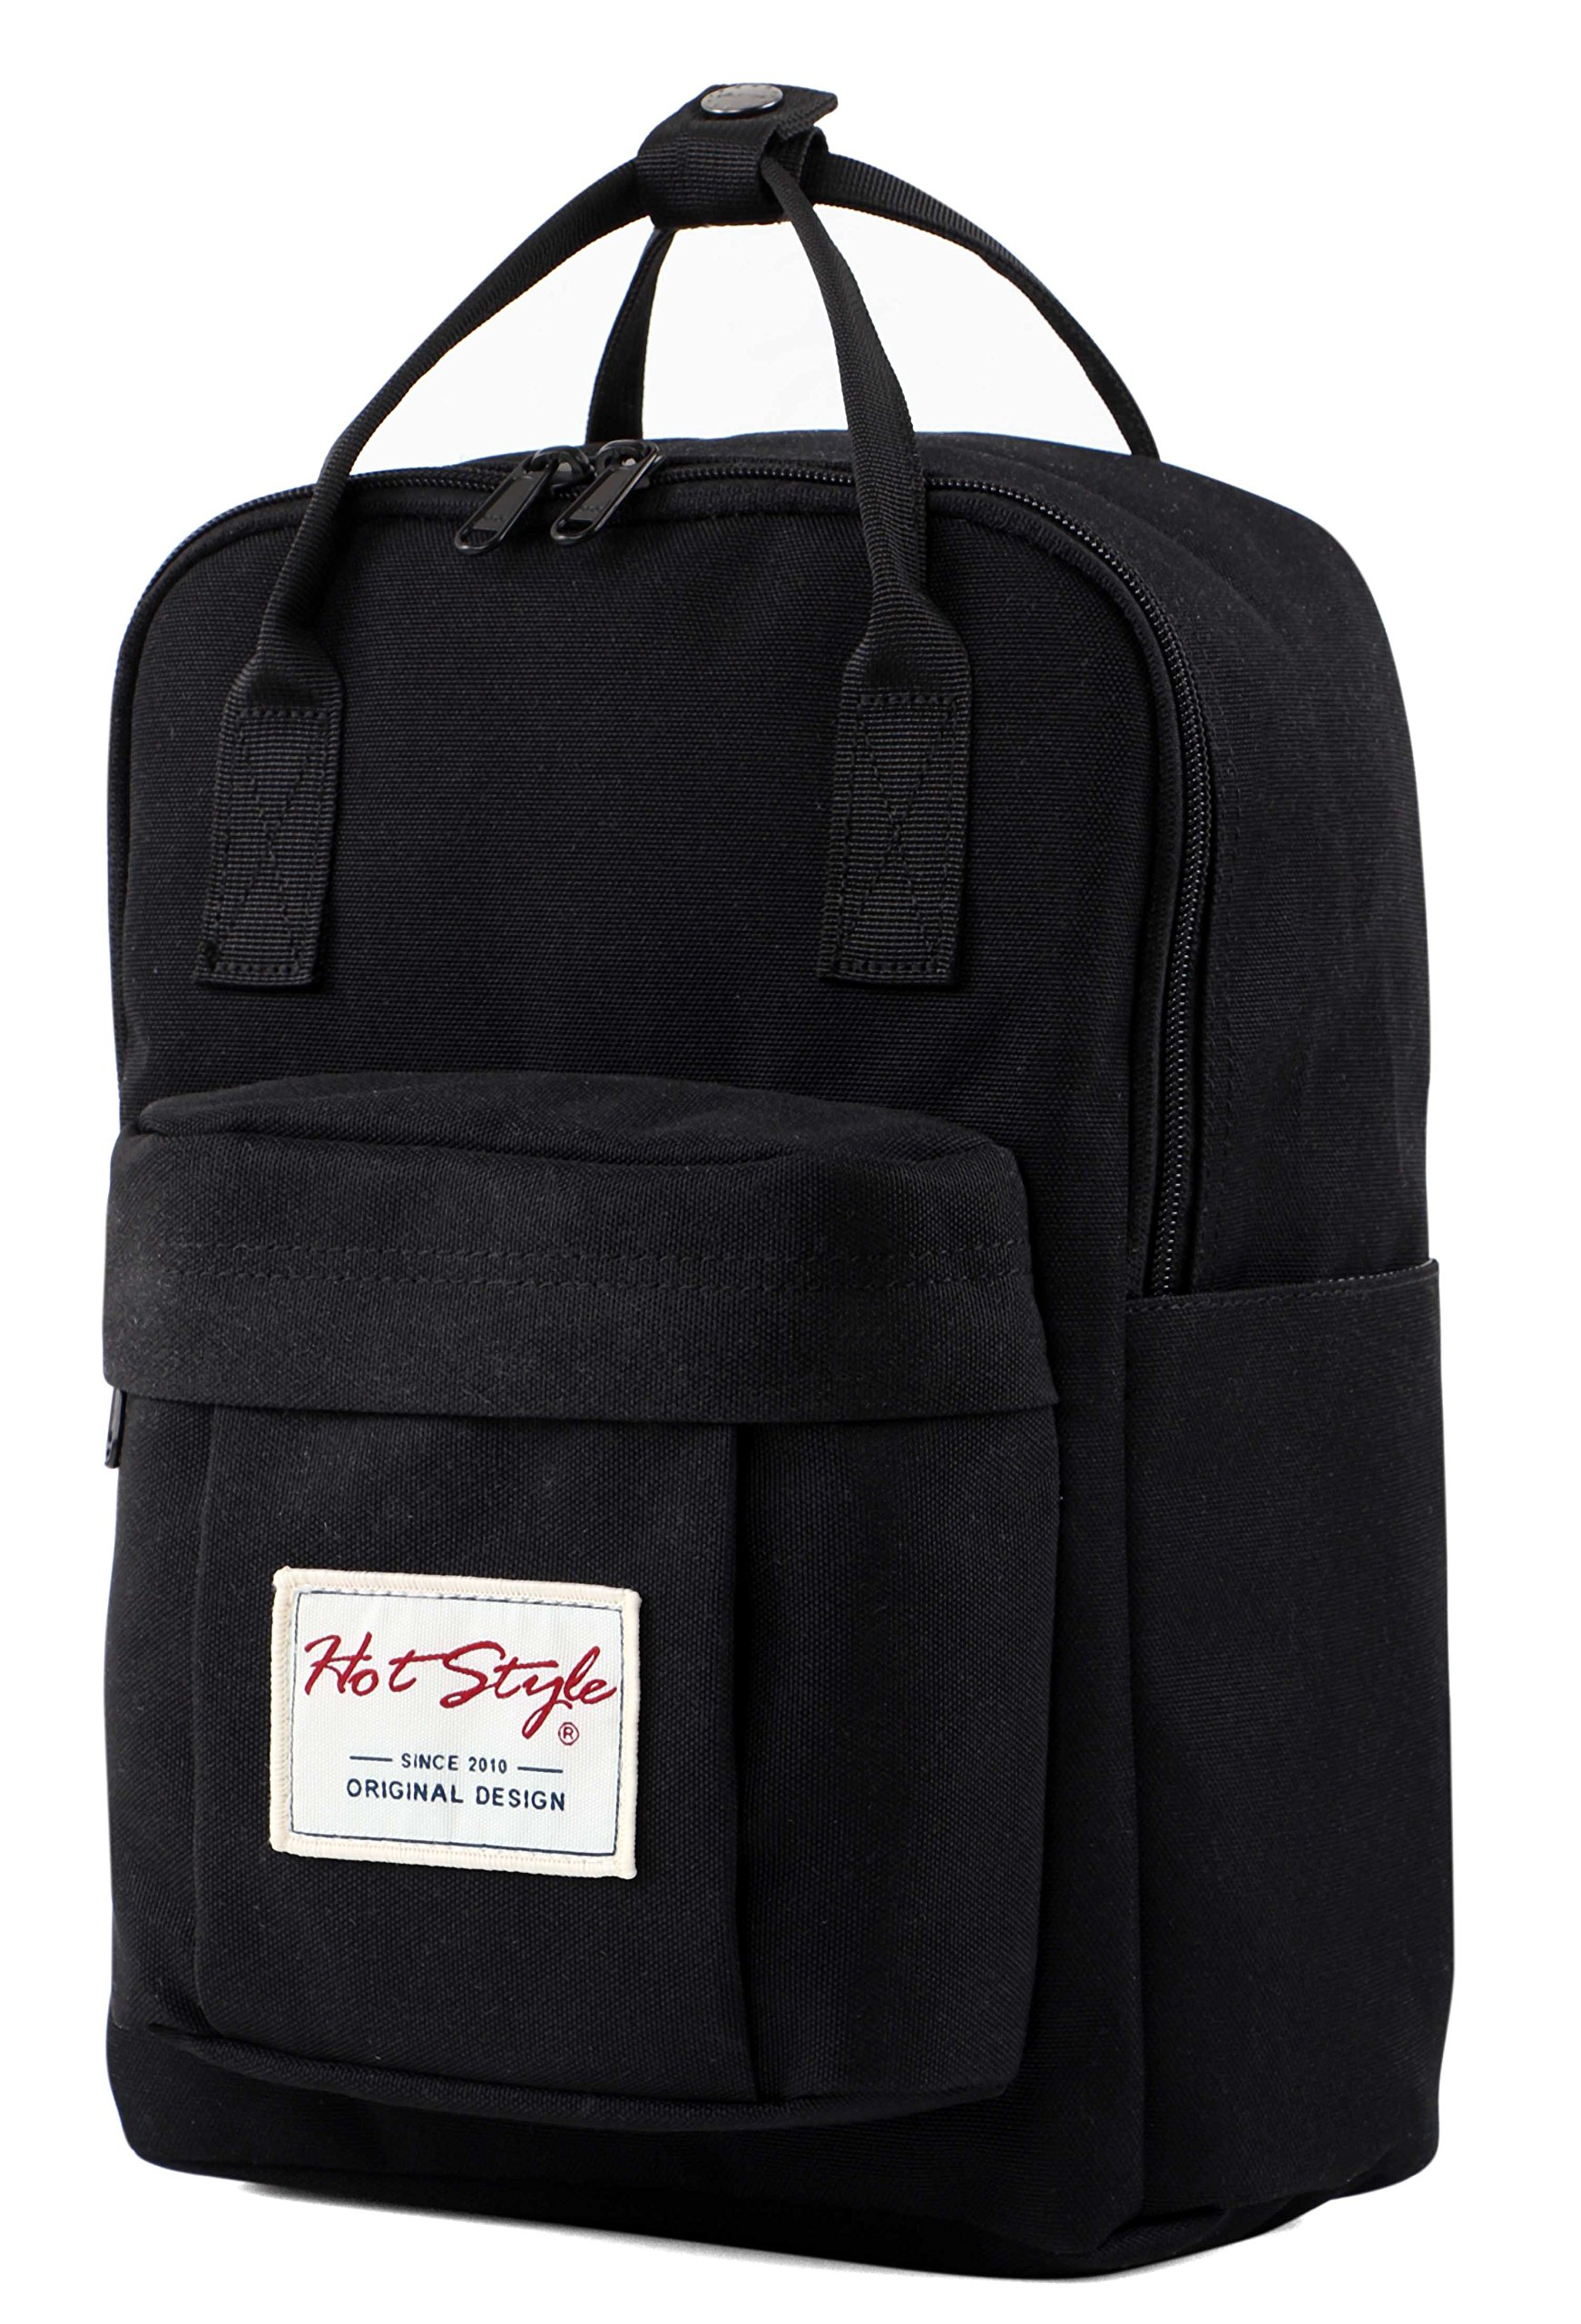 BESTIE 12'' Cute Mini Small Backpack Purse Travel Bag - Black